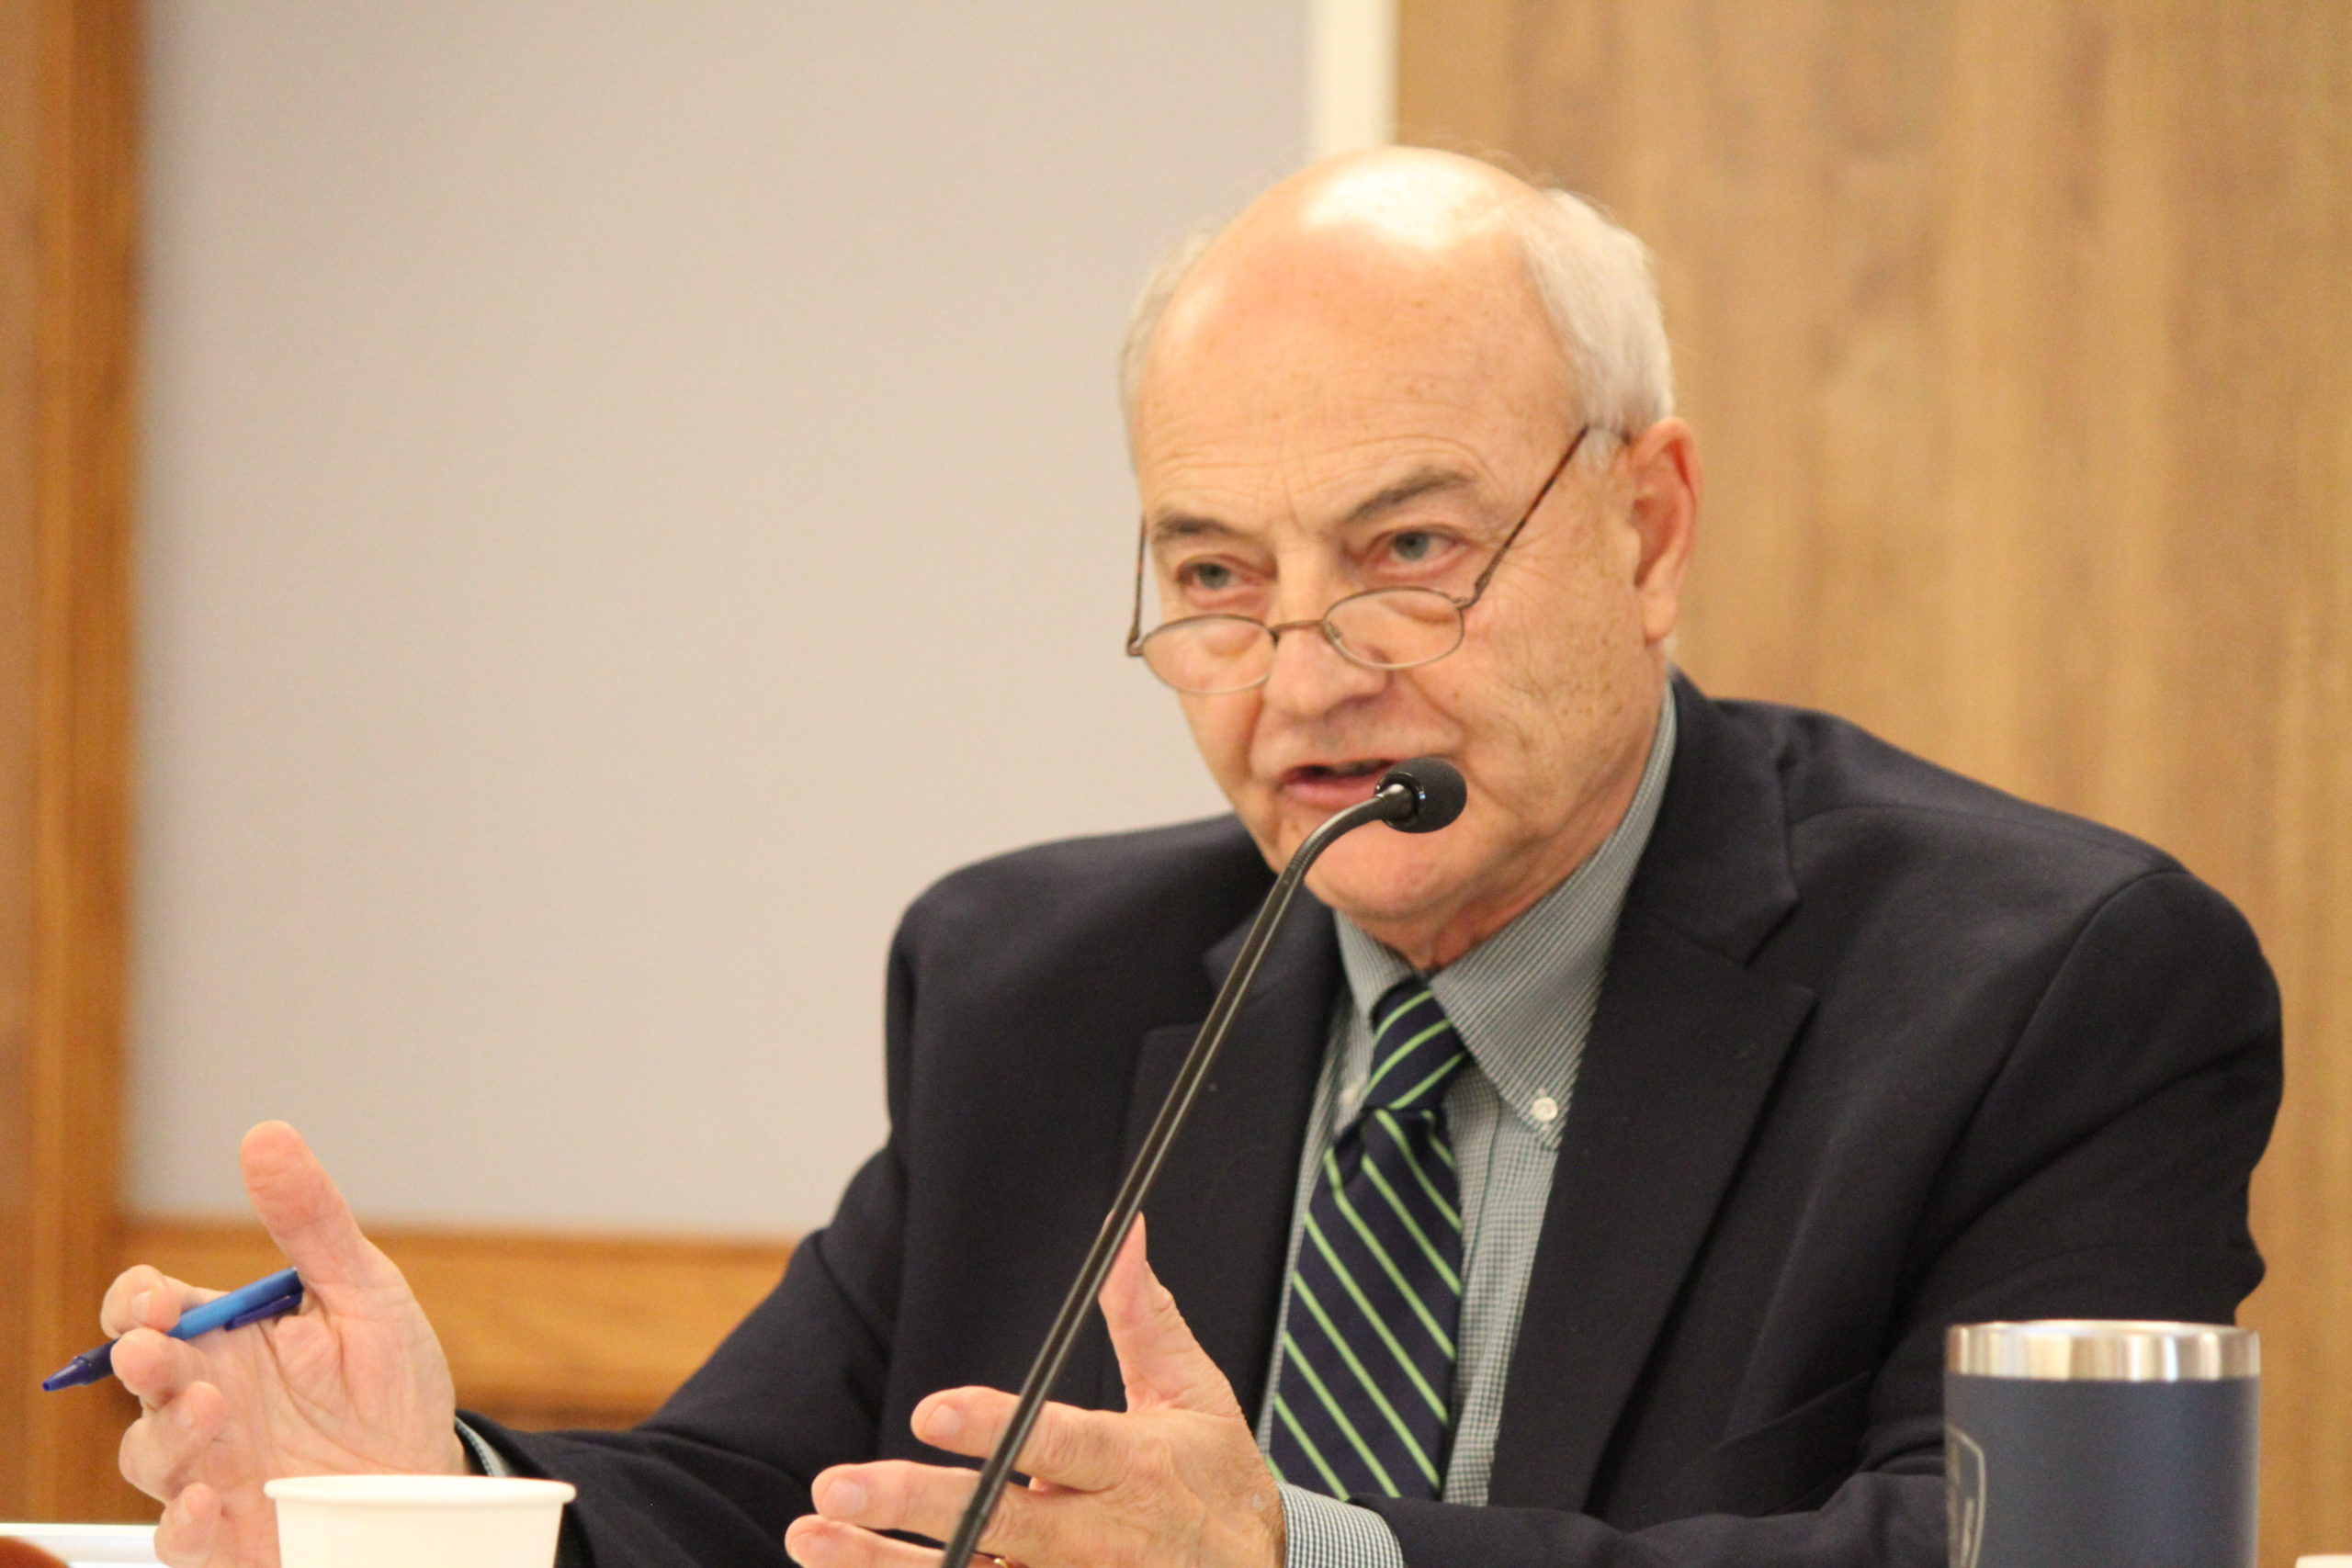 East Hampton Village Trustee Richard Lawler is currently the deputy mayor.